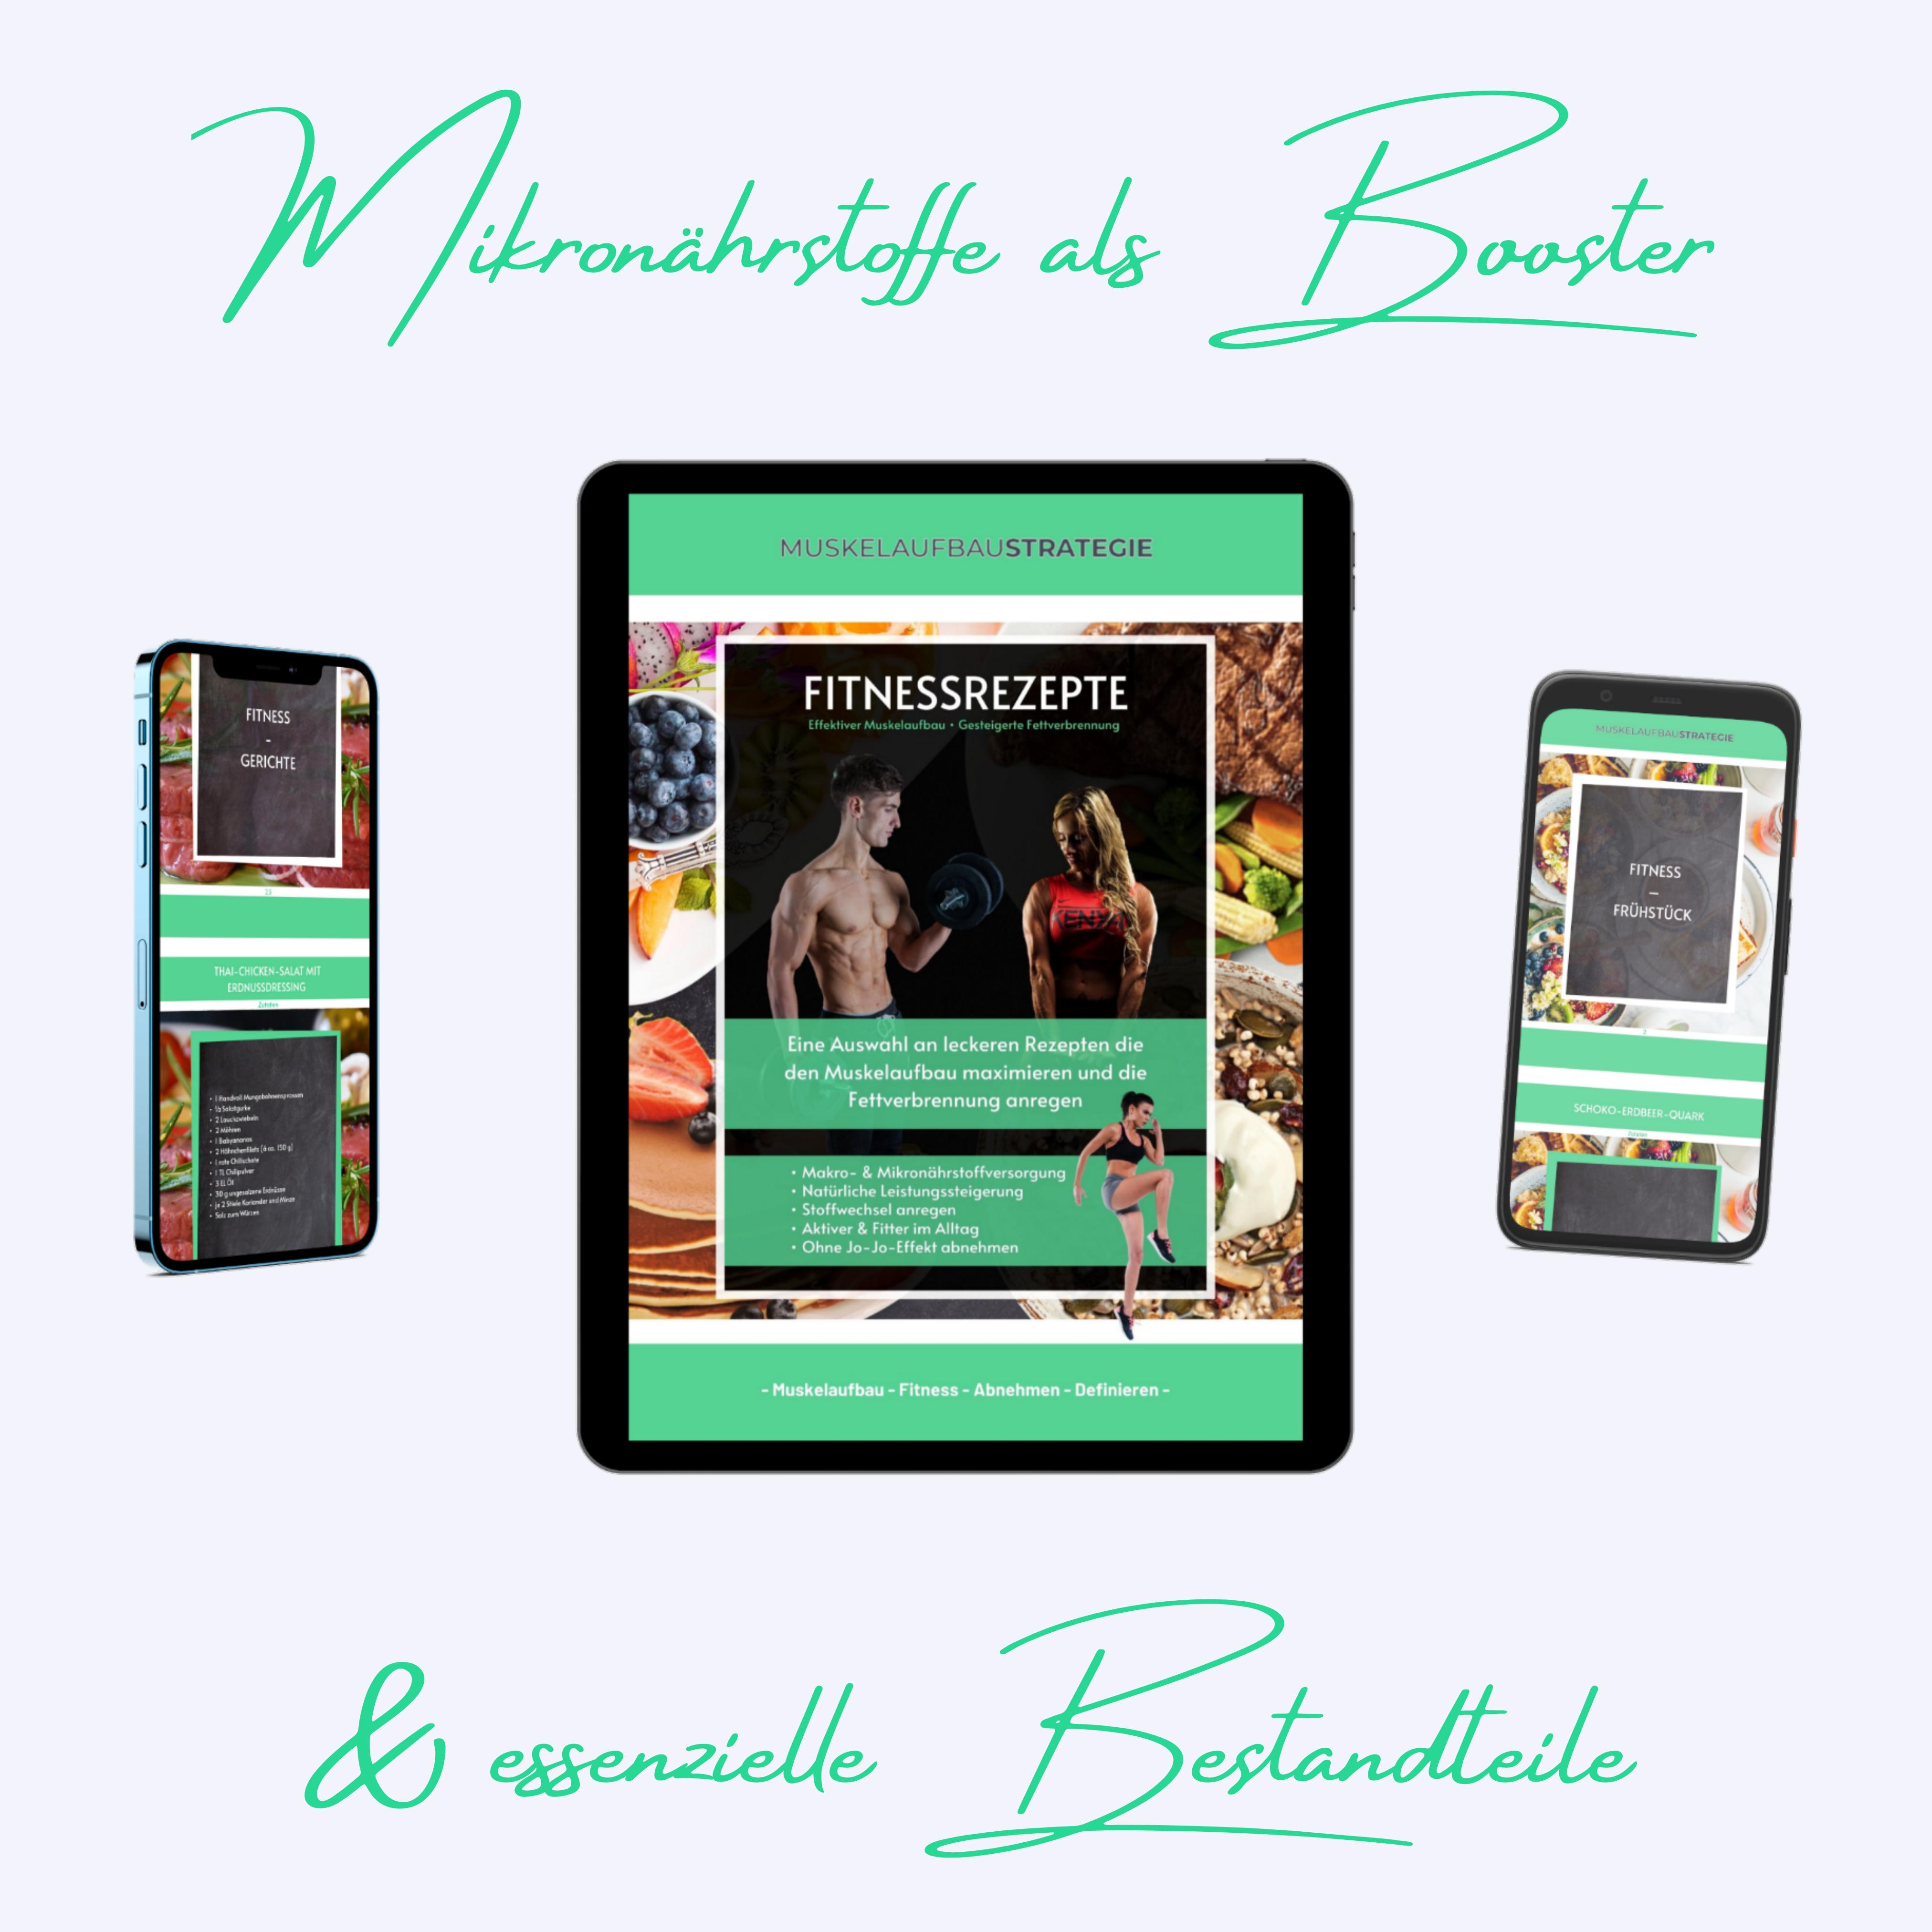 Fitnessrezepte, Fitness Kochbuch, Download